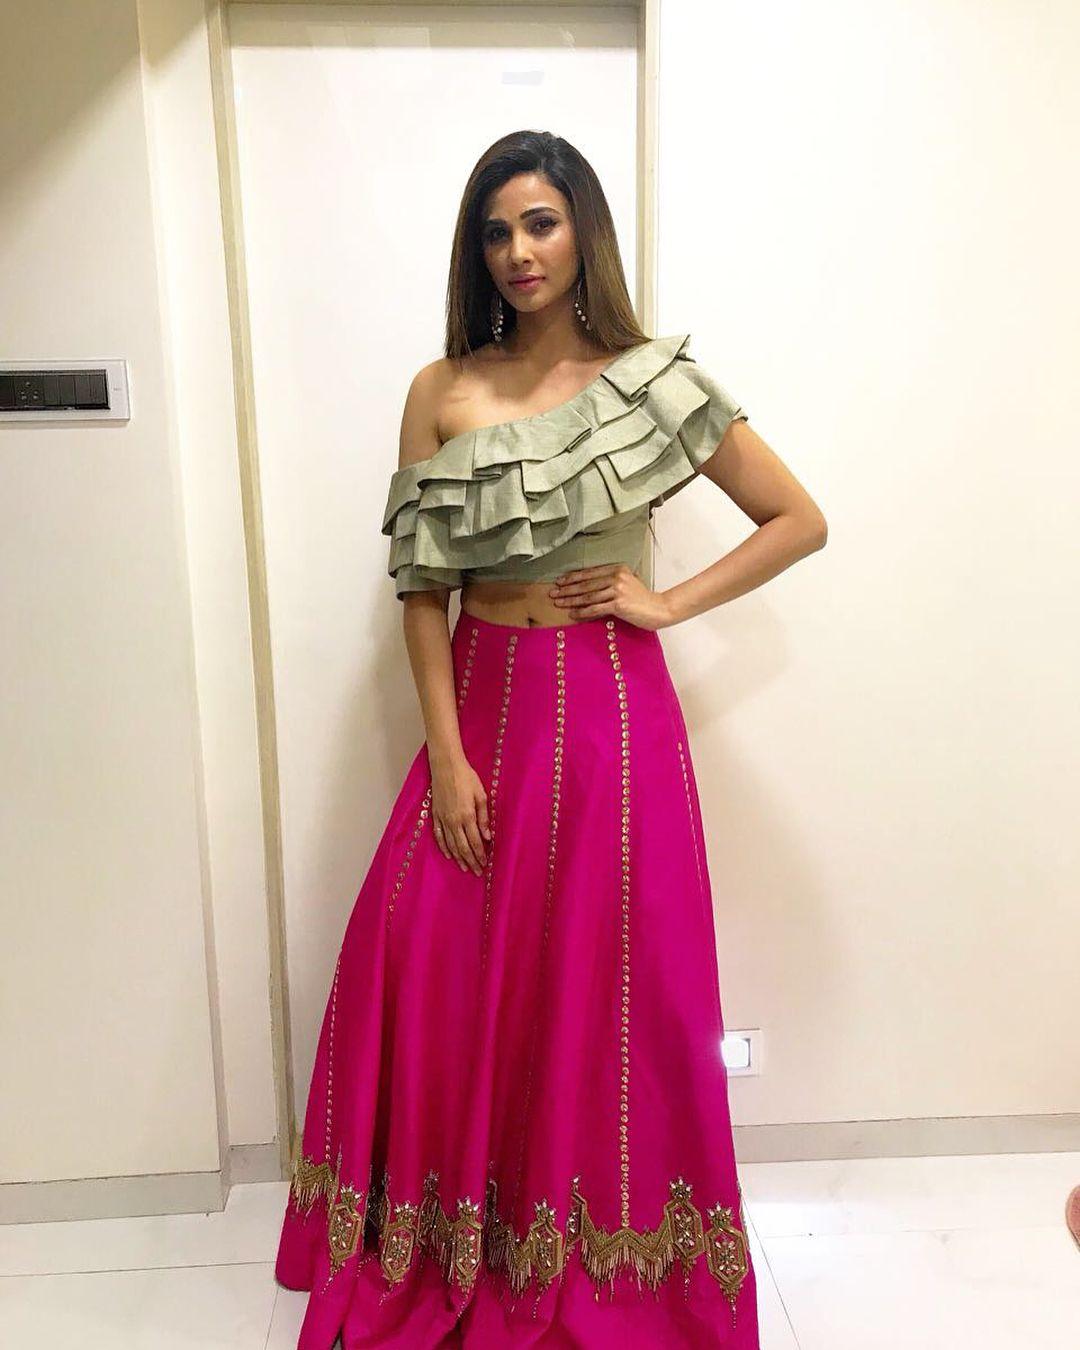 Beautiful at diwali party wearing outfit by jumki styling done rashmi jain designer wear also best images in rh pinterest